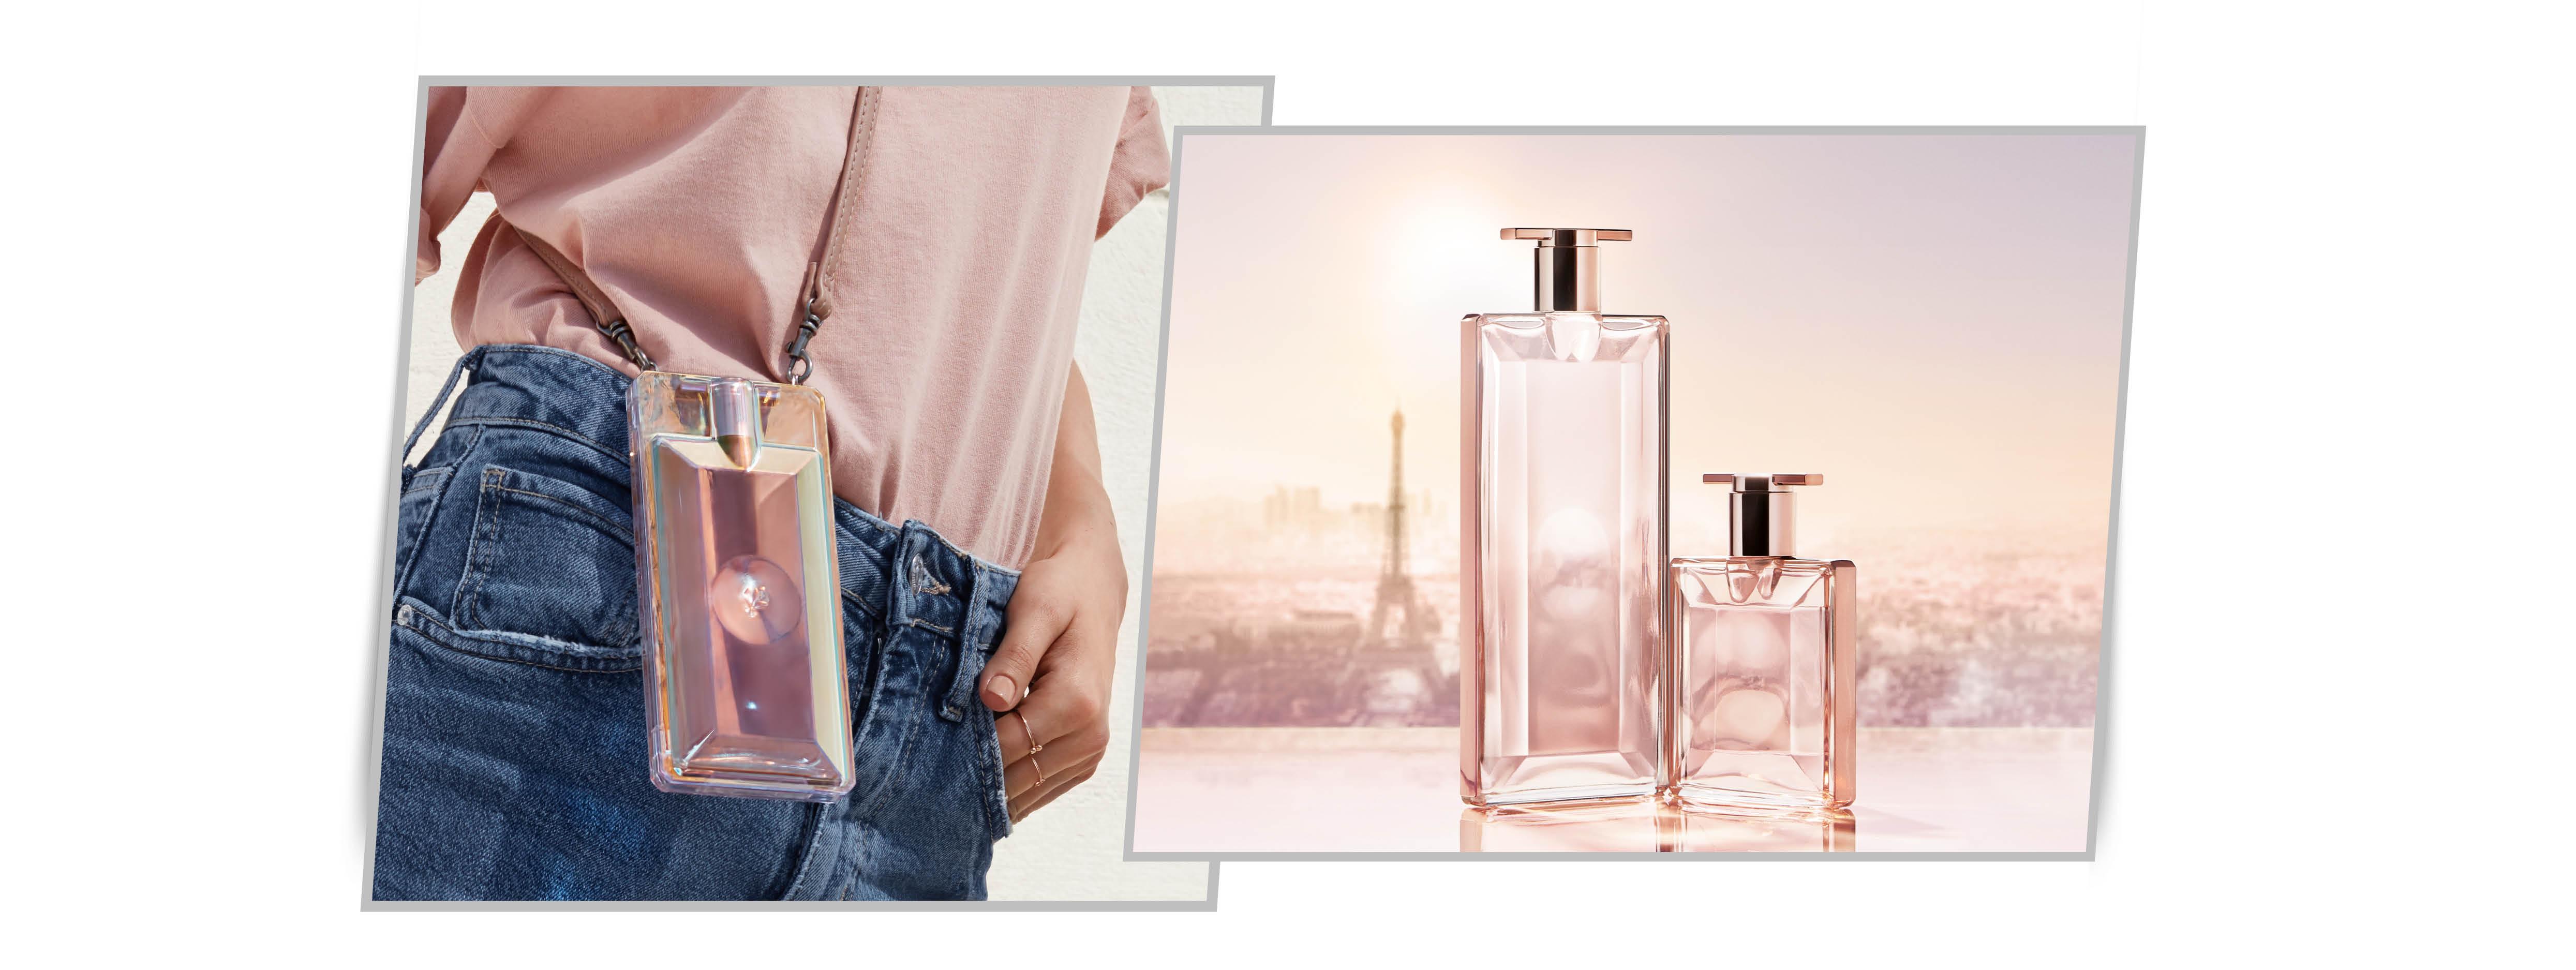 anuncio del perfume lancome idole 2019